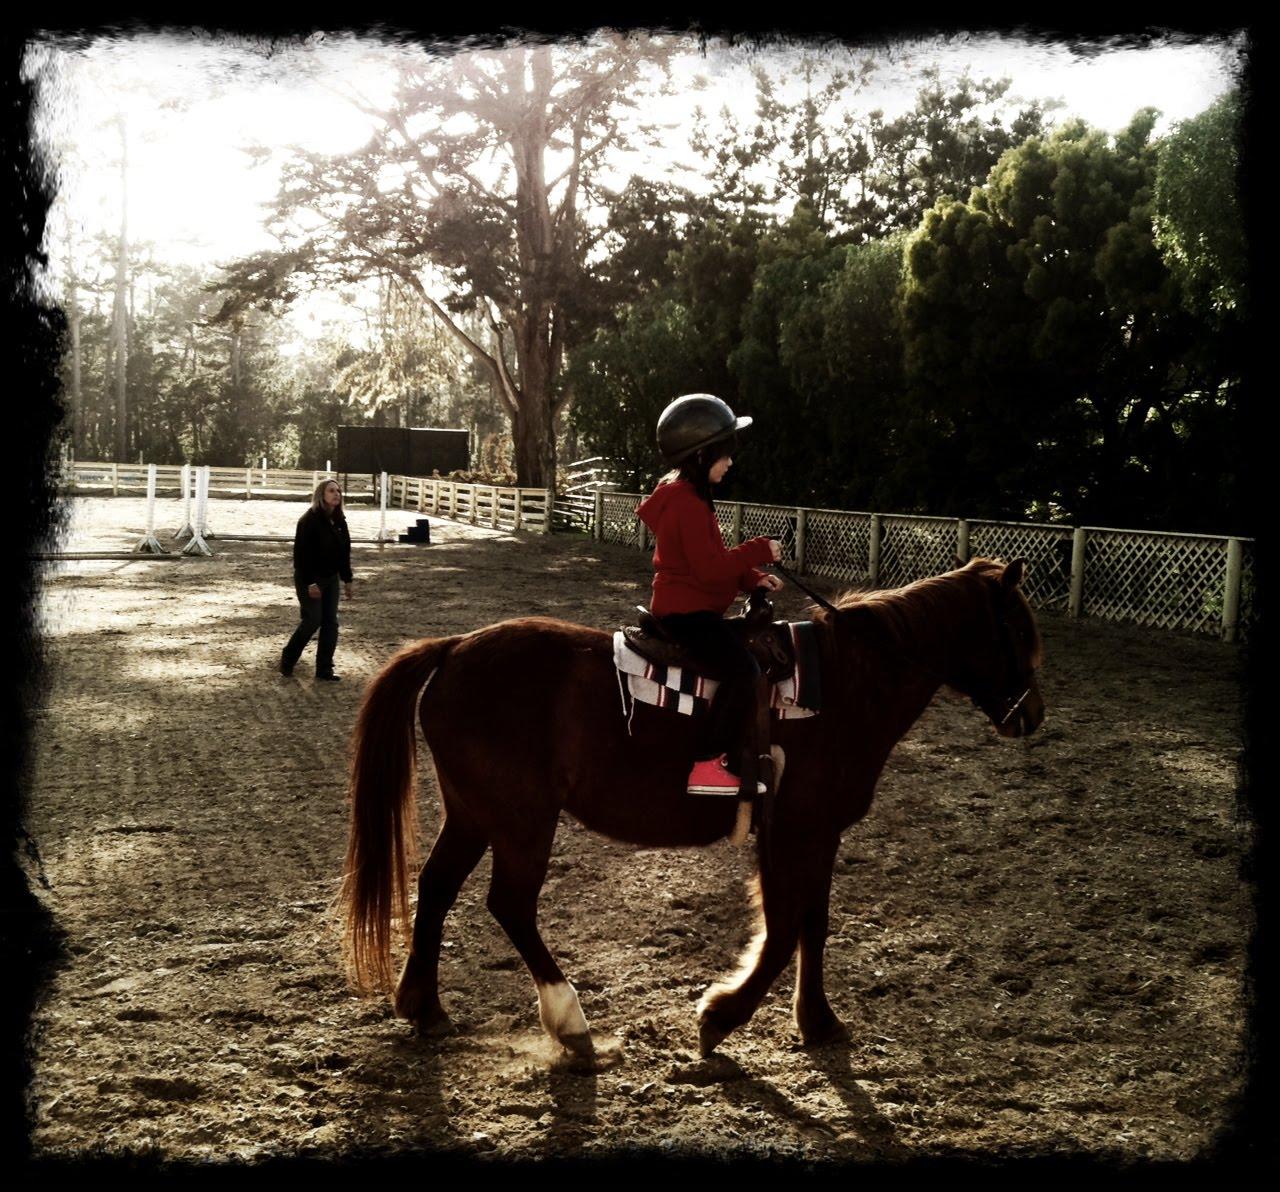 pebble beach equestrian center